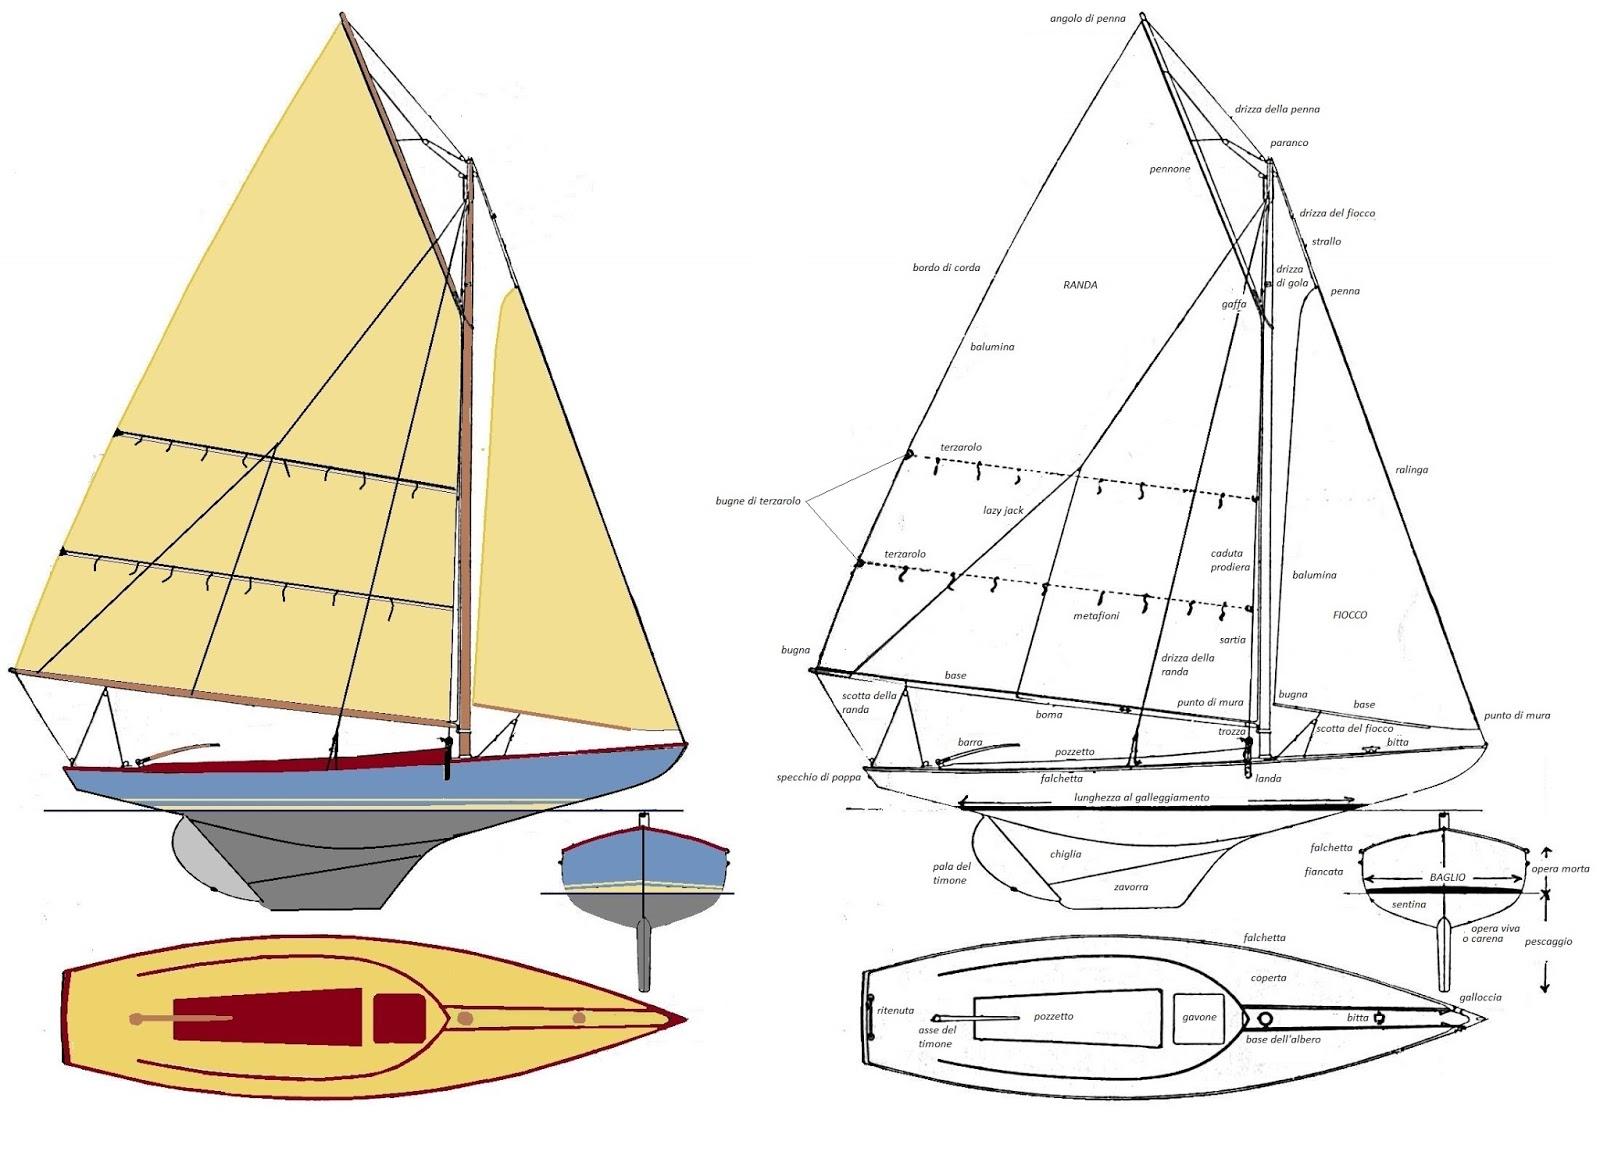 Parti Di Una Barca terraferma sailors: le parti di una barca a vela